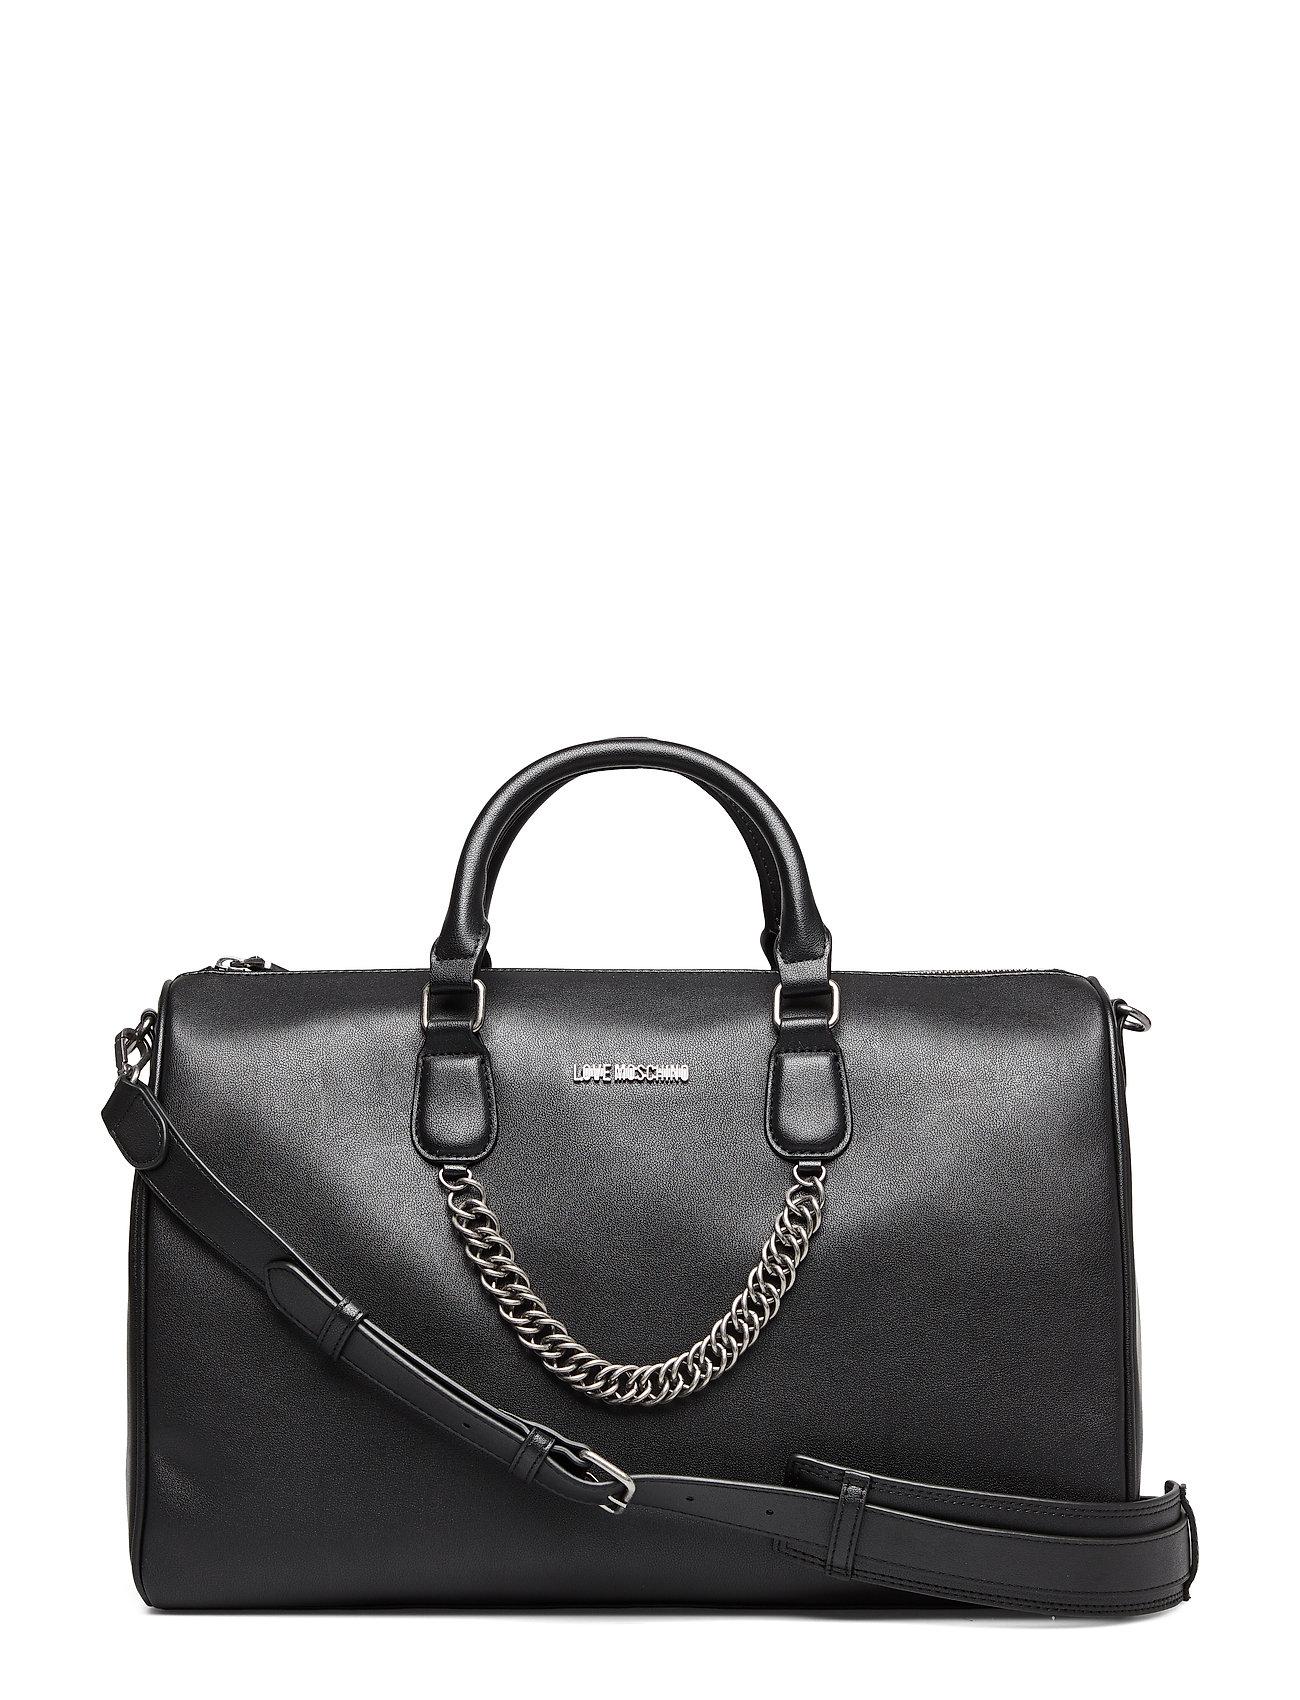 Love Moschino Bags EASY CHAIN, EASY GO - BLACK